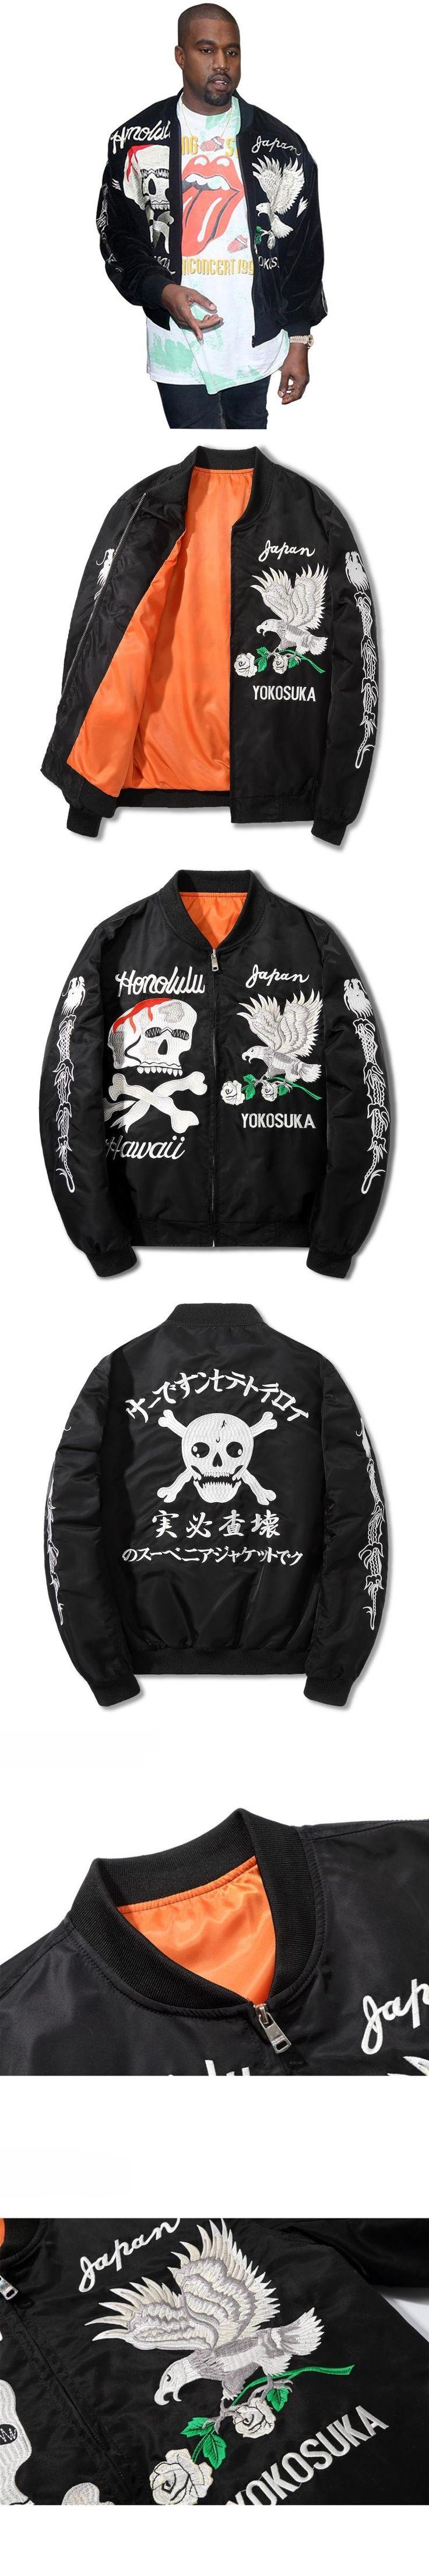 AmberHeard Autumn Winter Kanye West Men Jacket Hip Hop Streetwear Embroidery Ma1 Bomber Jacket Yokosuka Coat Jaquetas Masculino